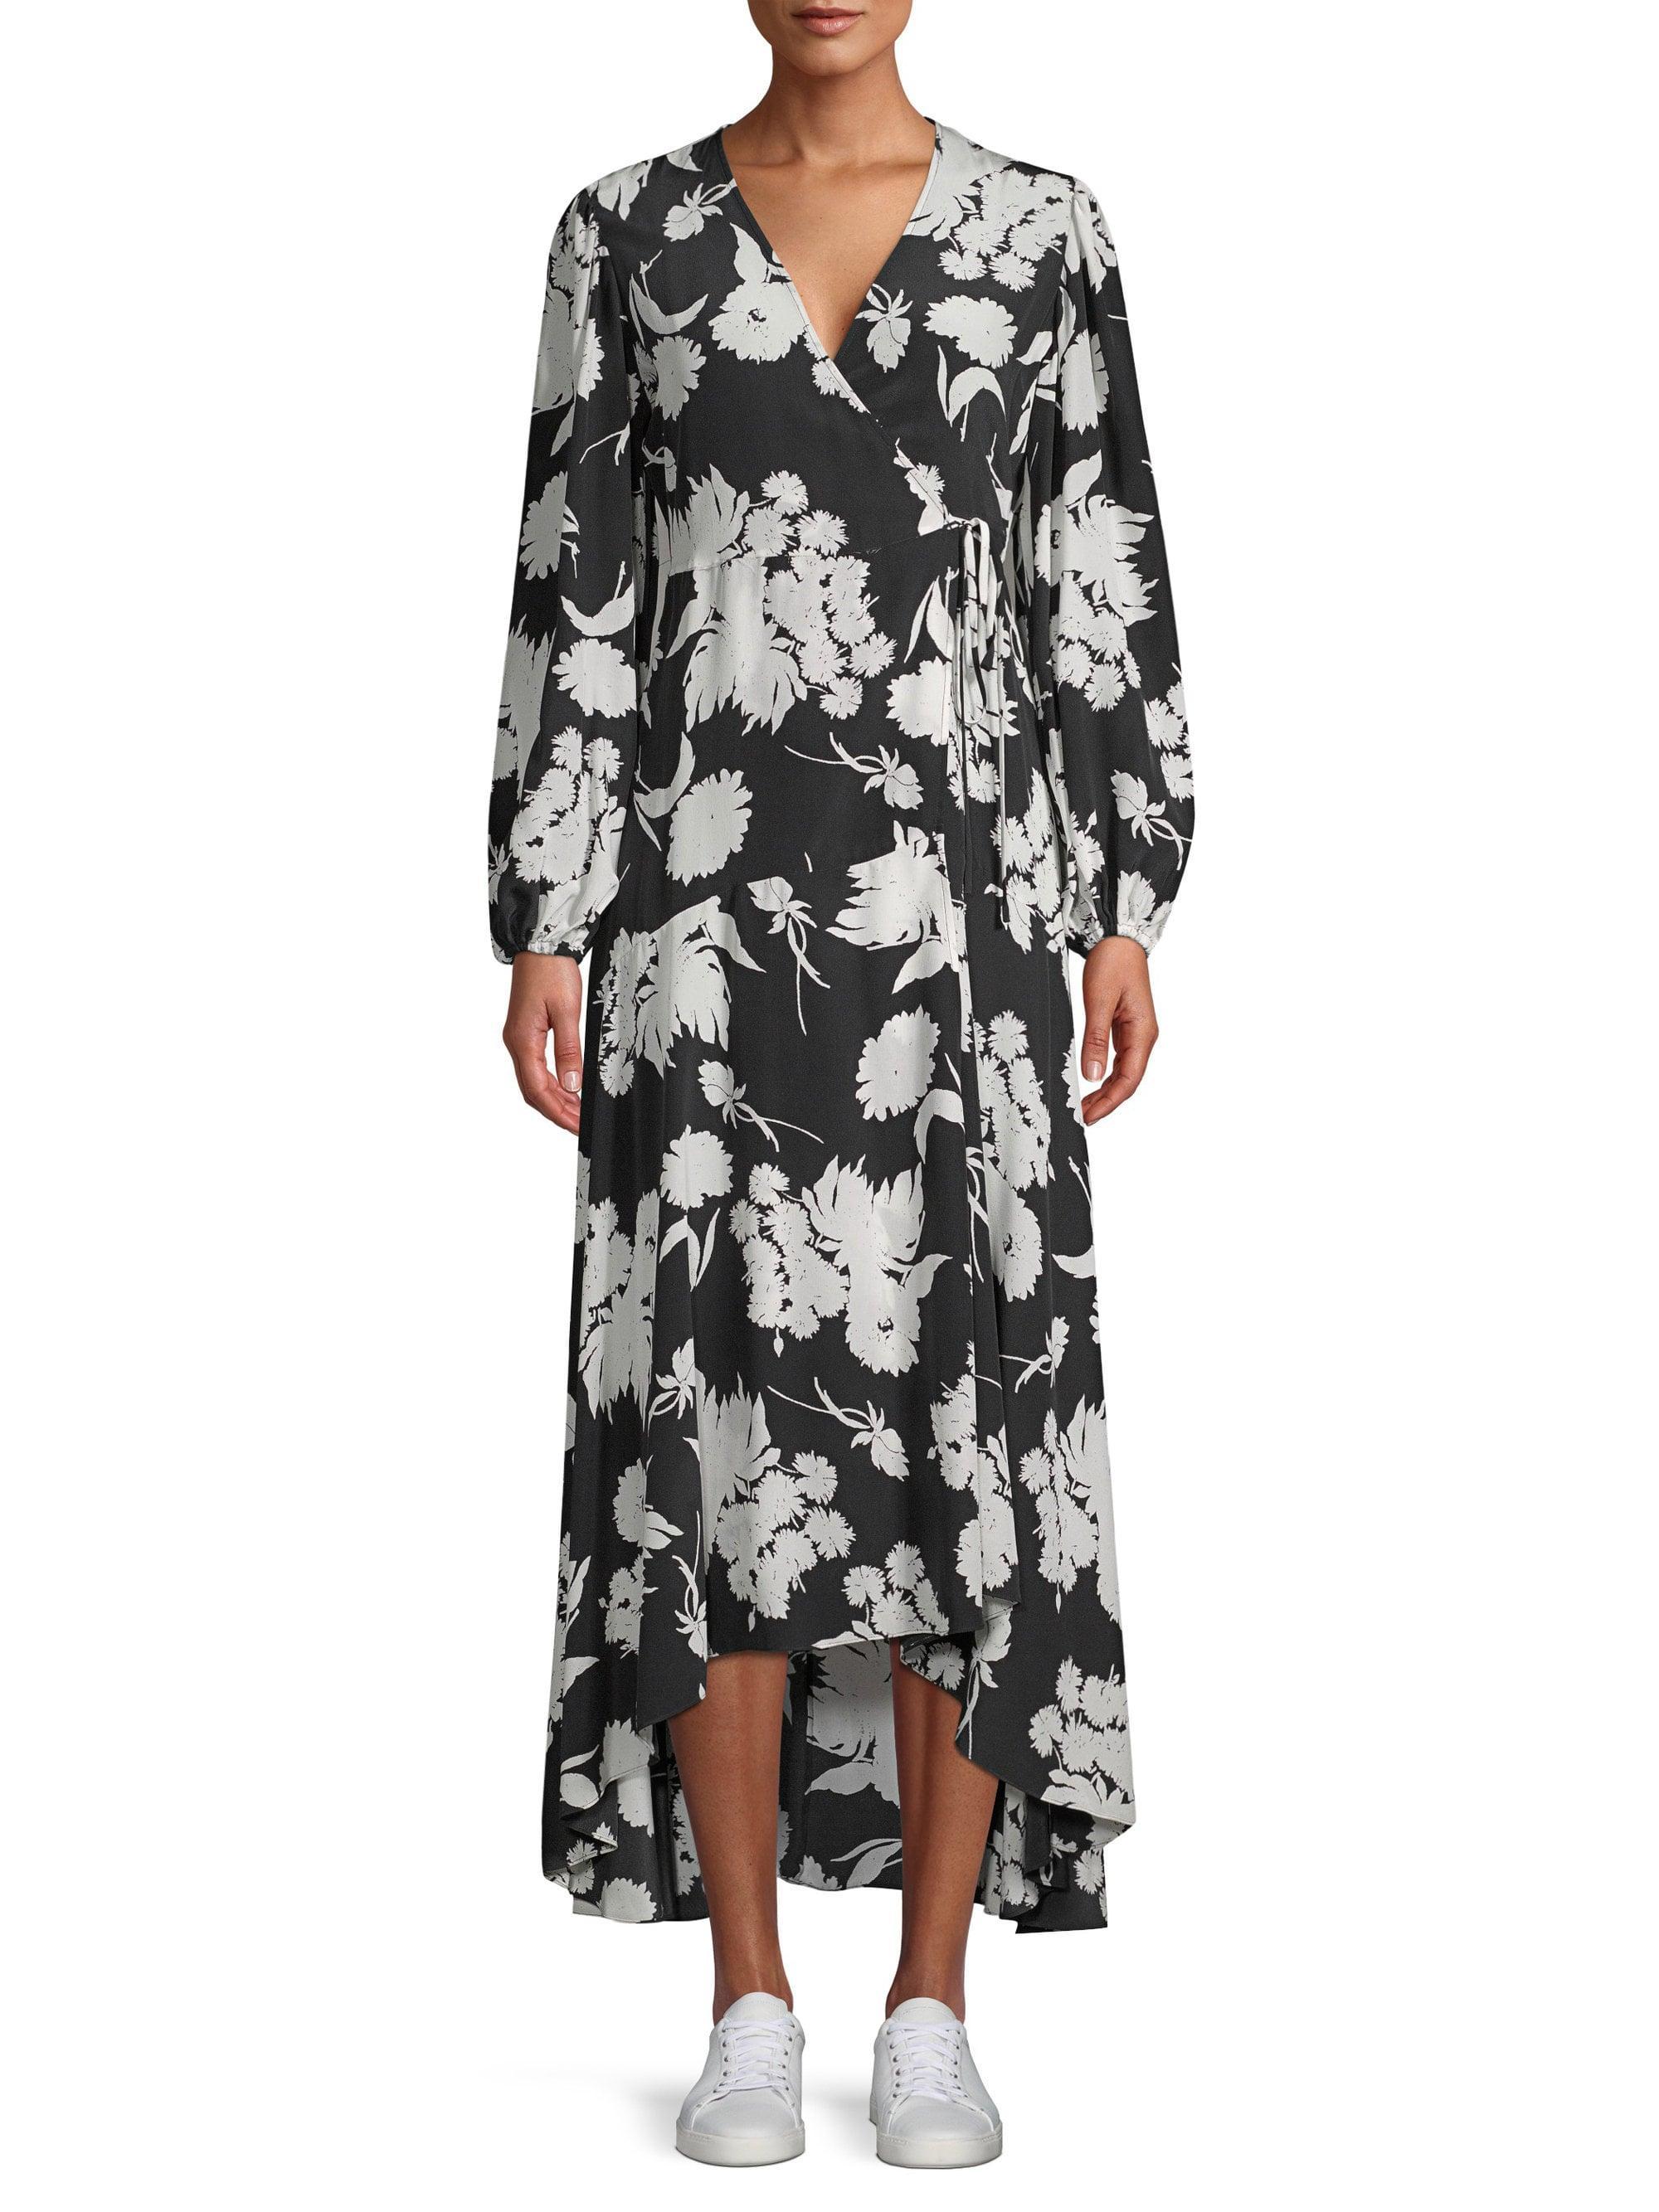 537607ed70 Ganni Kochhar Silk Hi-lo Maxi Dress in Black - Save 89% - Lyst